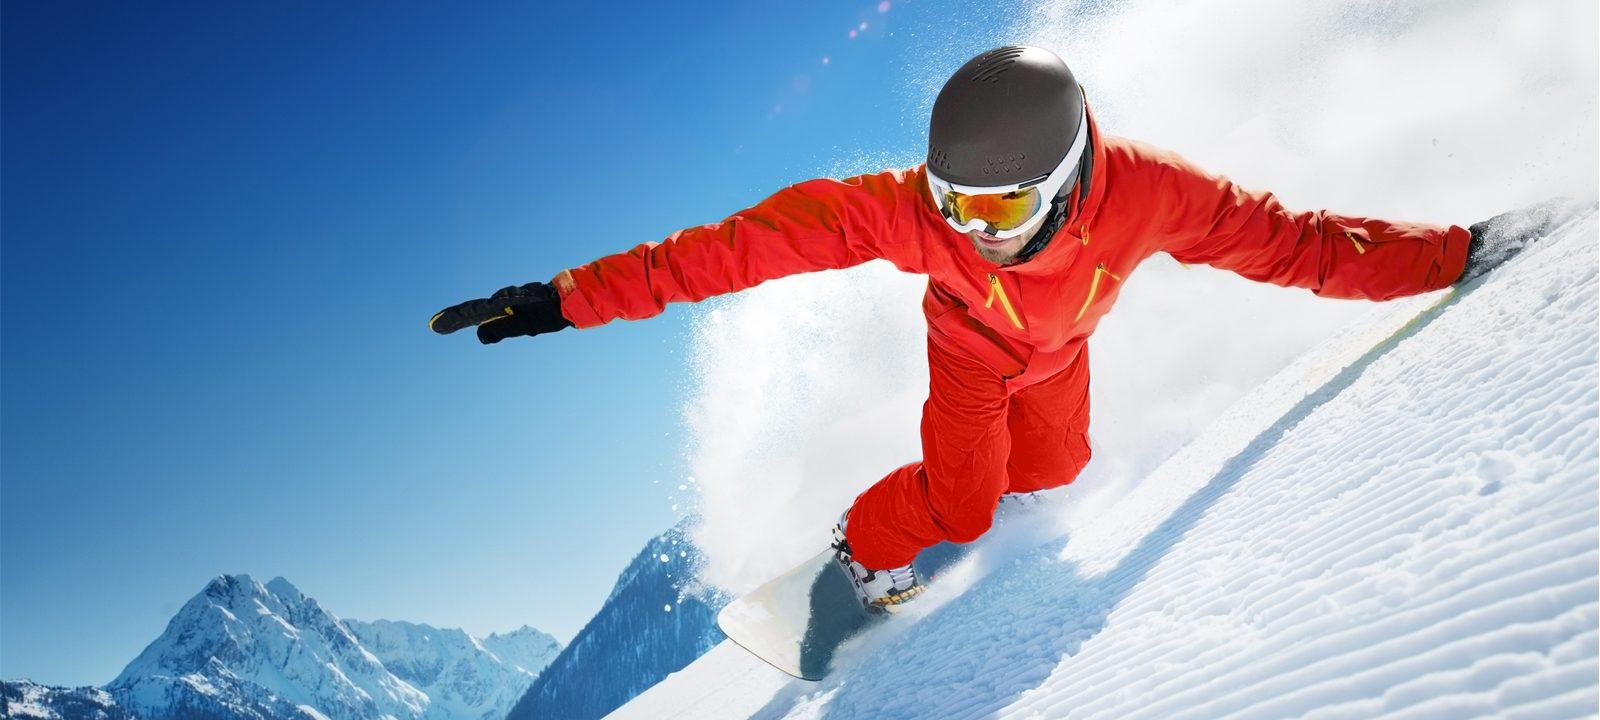 Bild 1 Snowboard